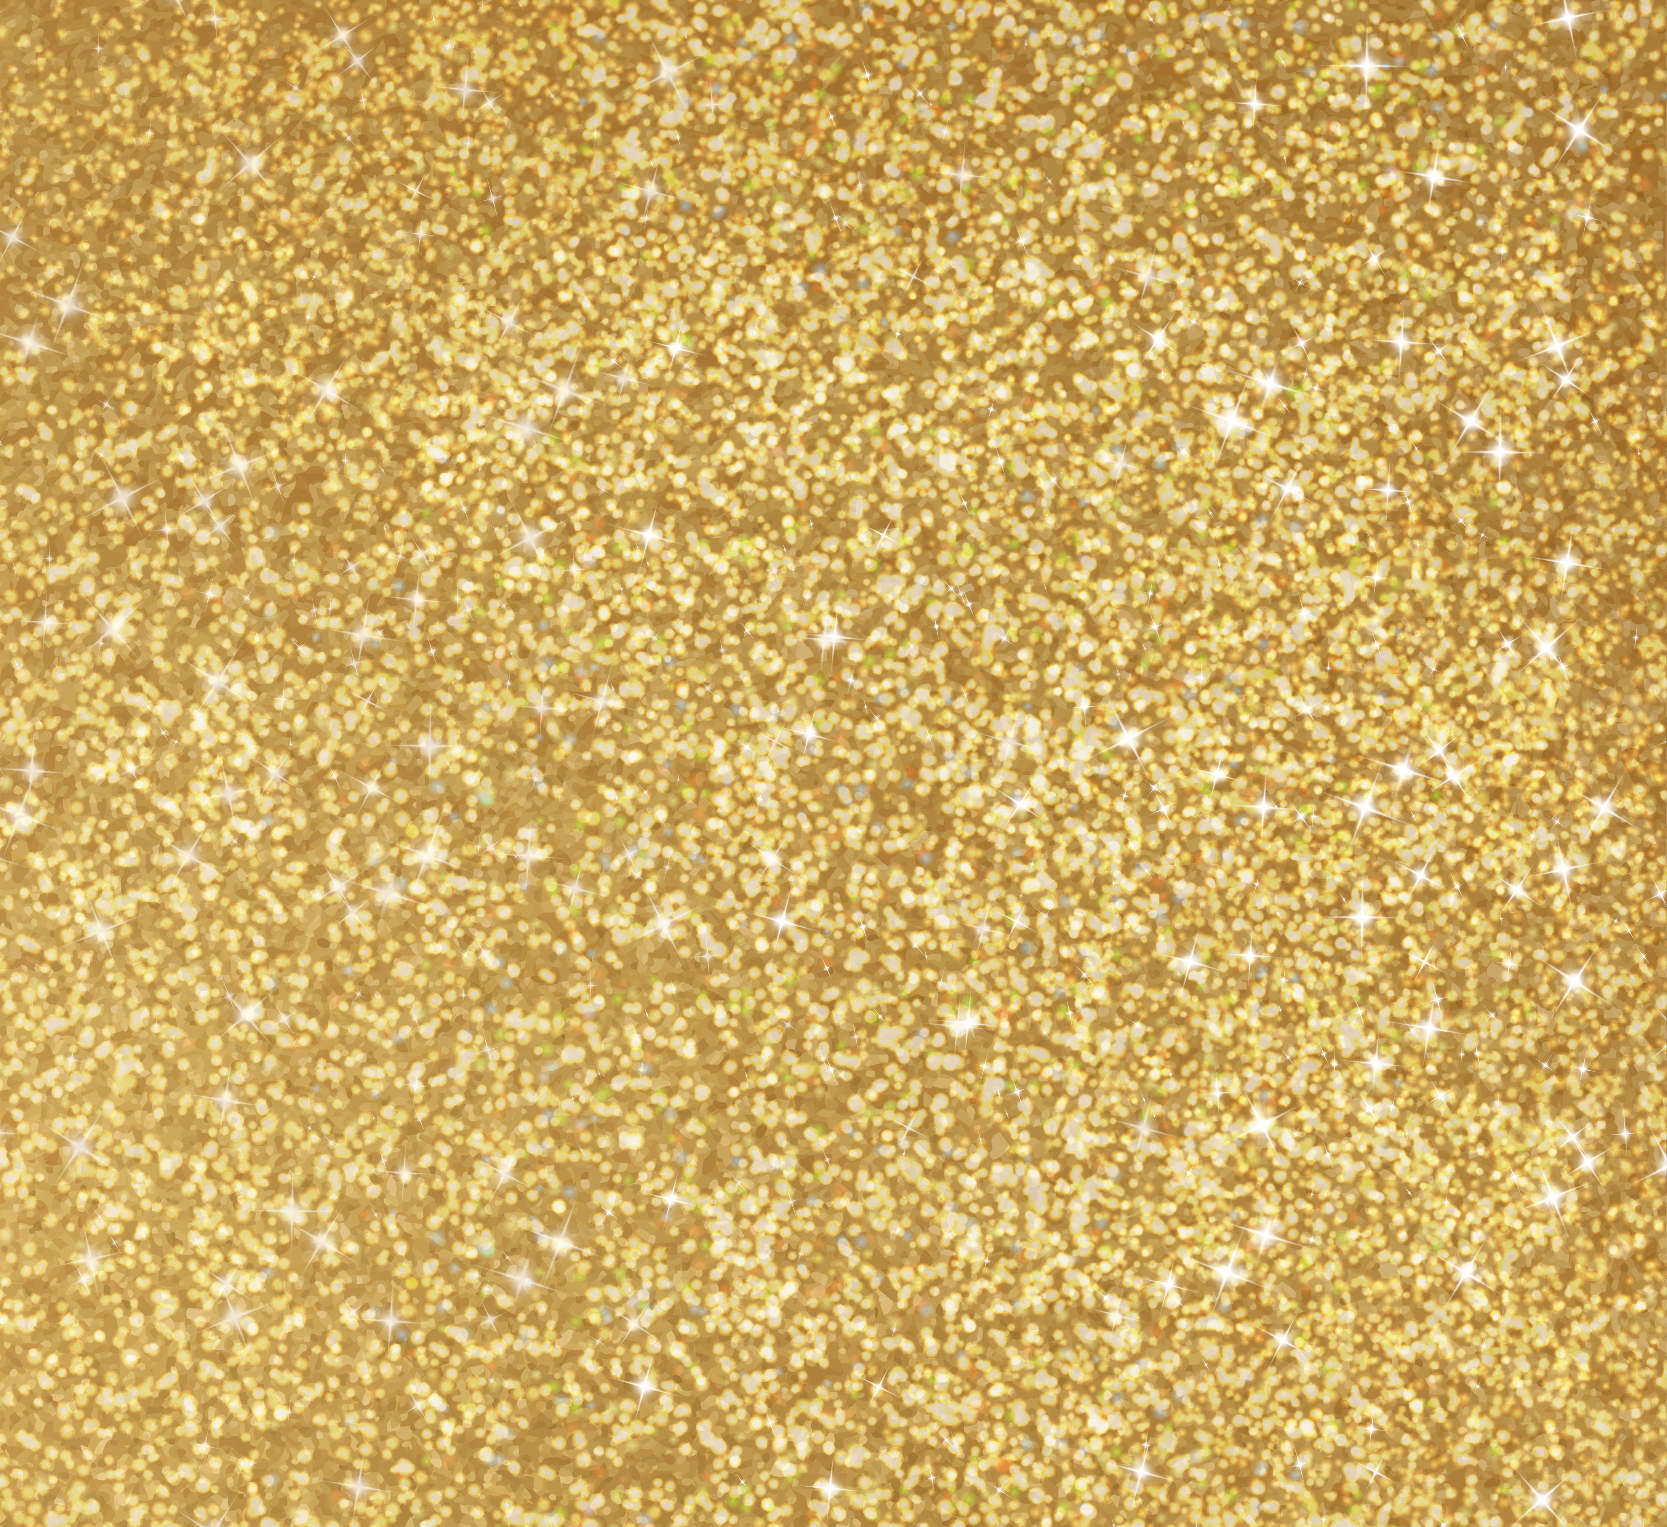 15 Gold Backgrounds FreeCreatives 1667x1527